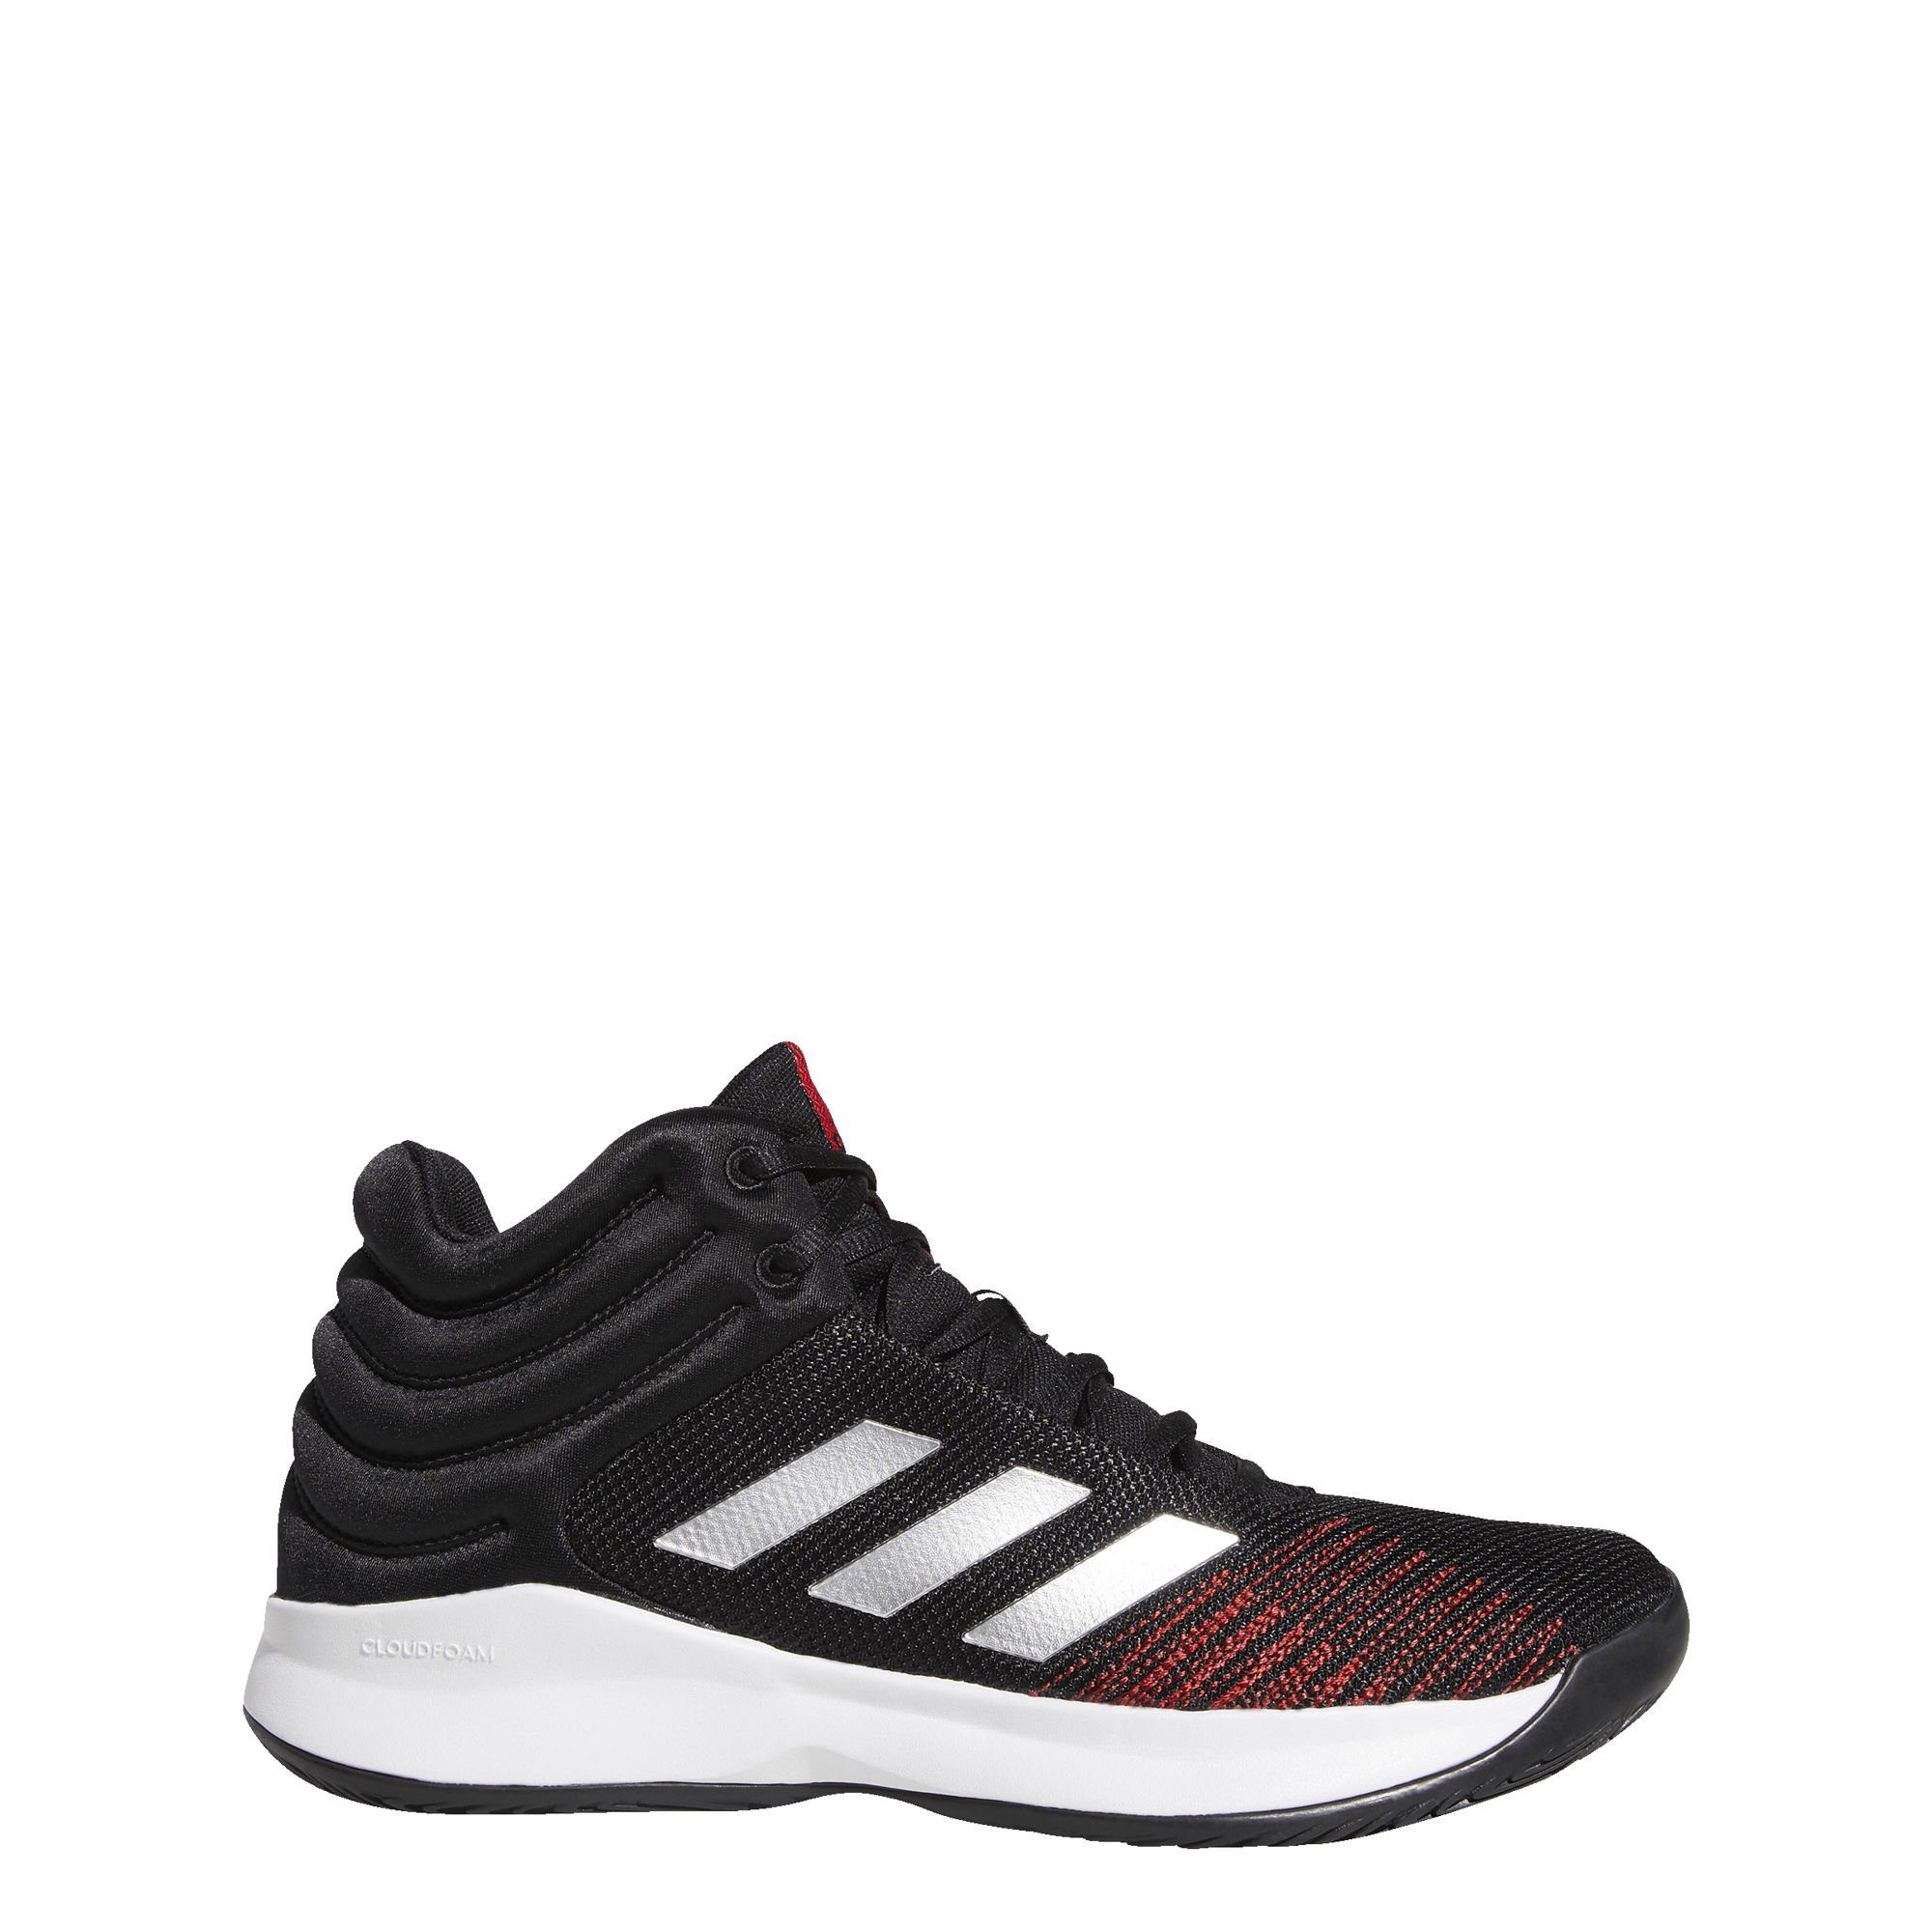 Schuhe adidas Performance PRO SPARK 2018 Basketballschuh